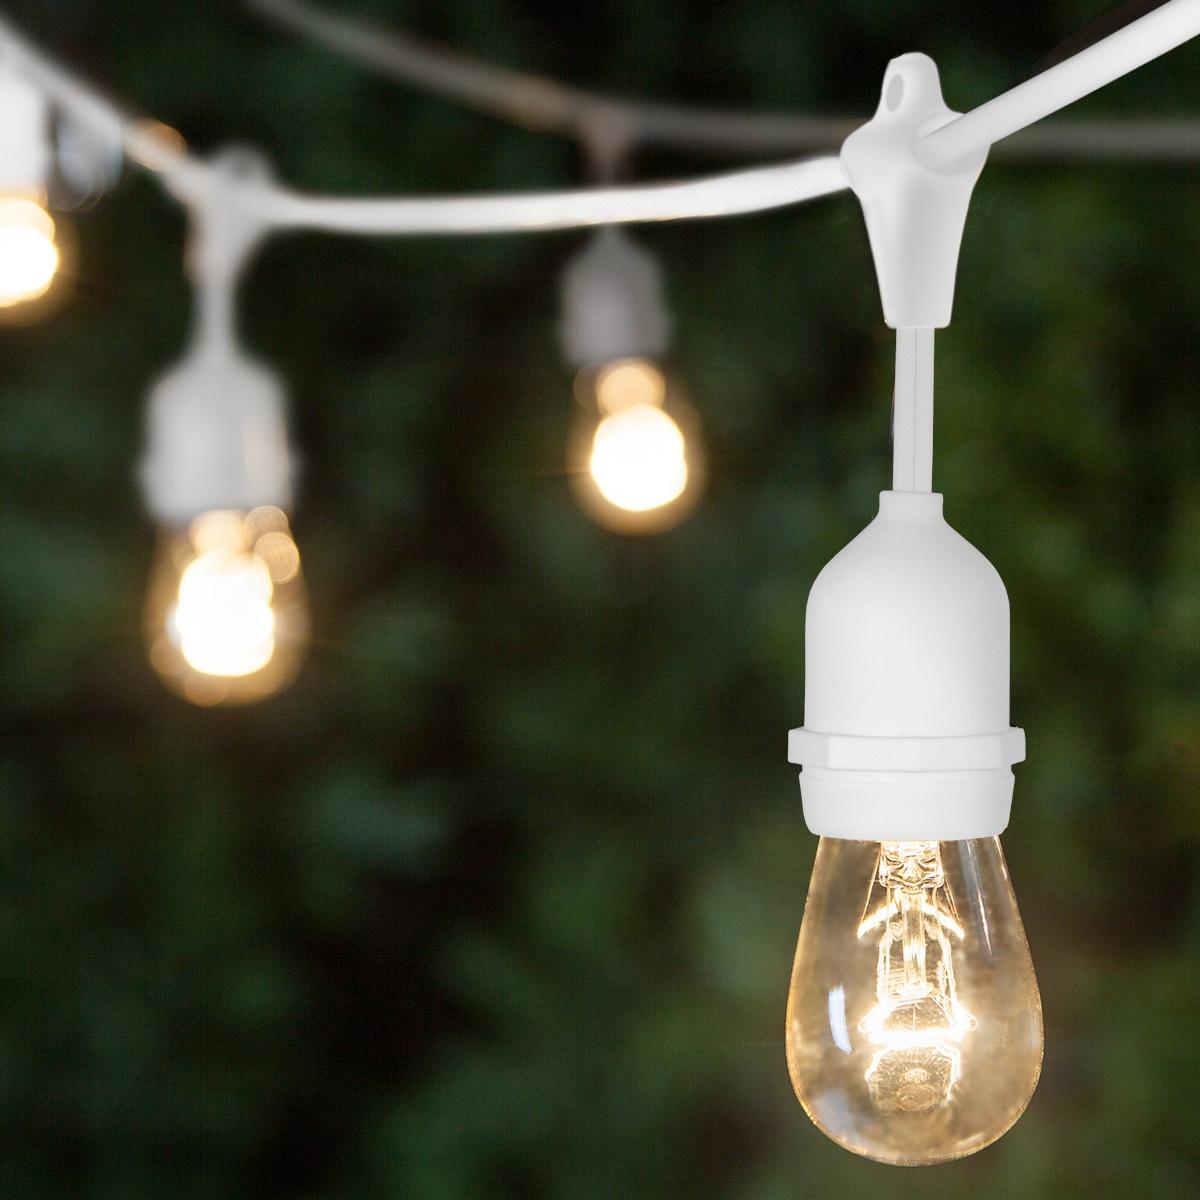 Patio String Lights Clear S14 Bulbs